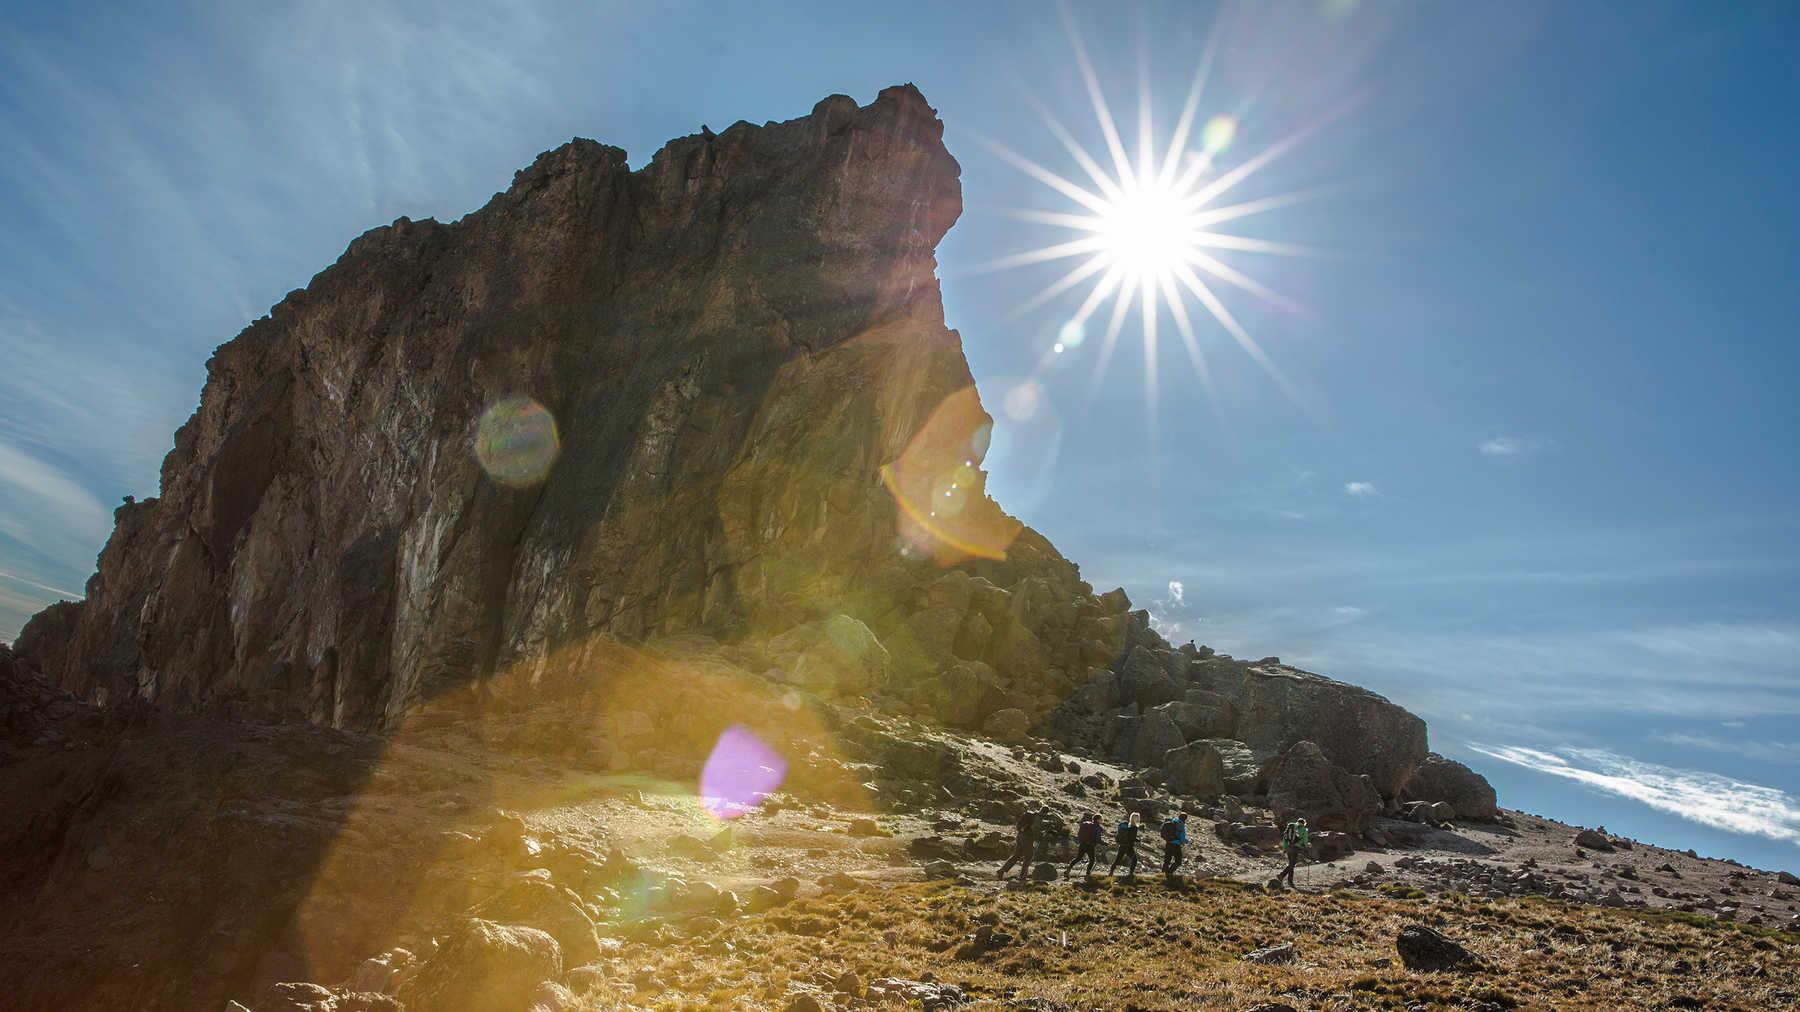 Kilimanjaro - Machame Route & Zanzibar Adventure Tanzania